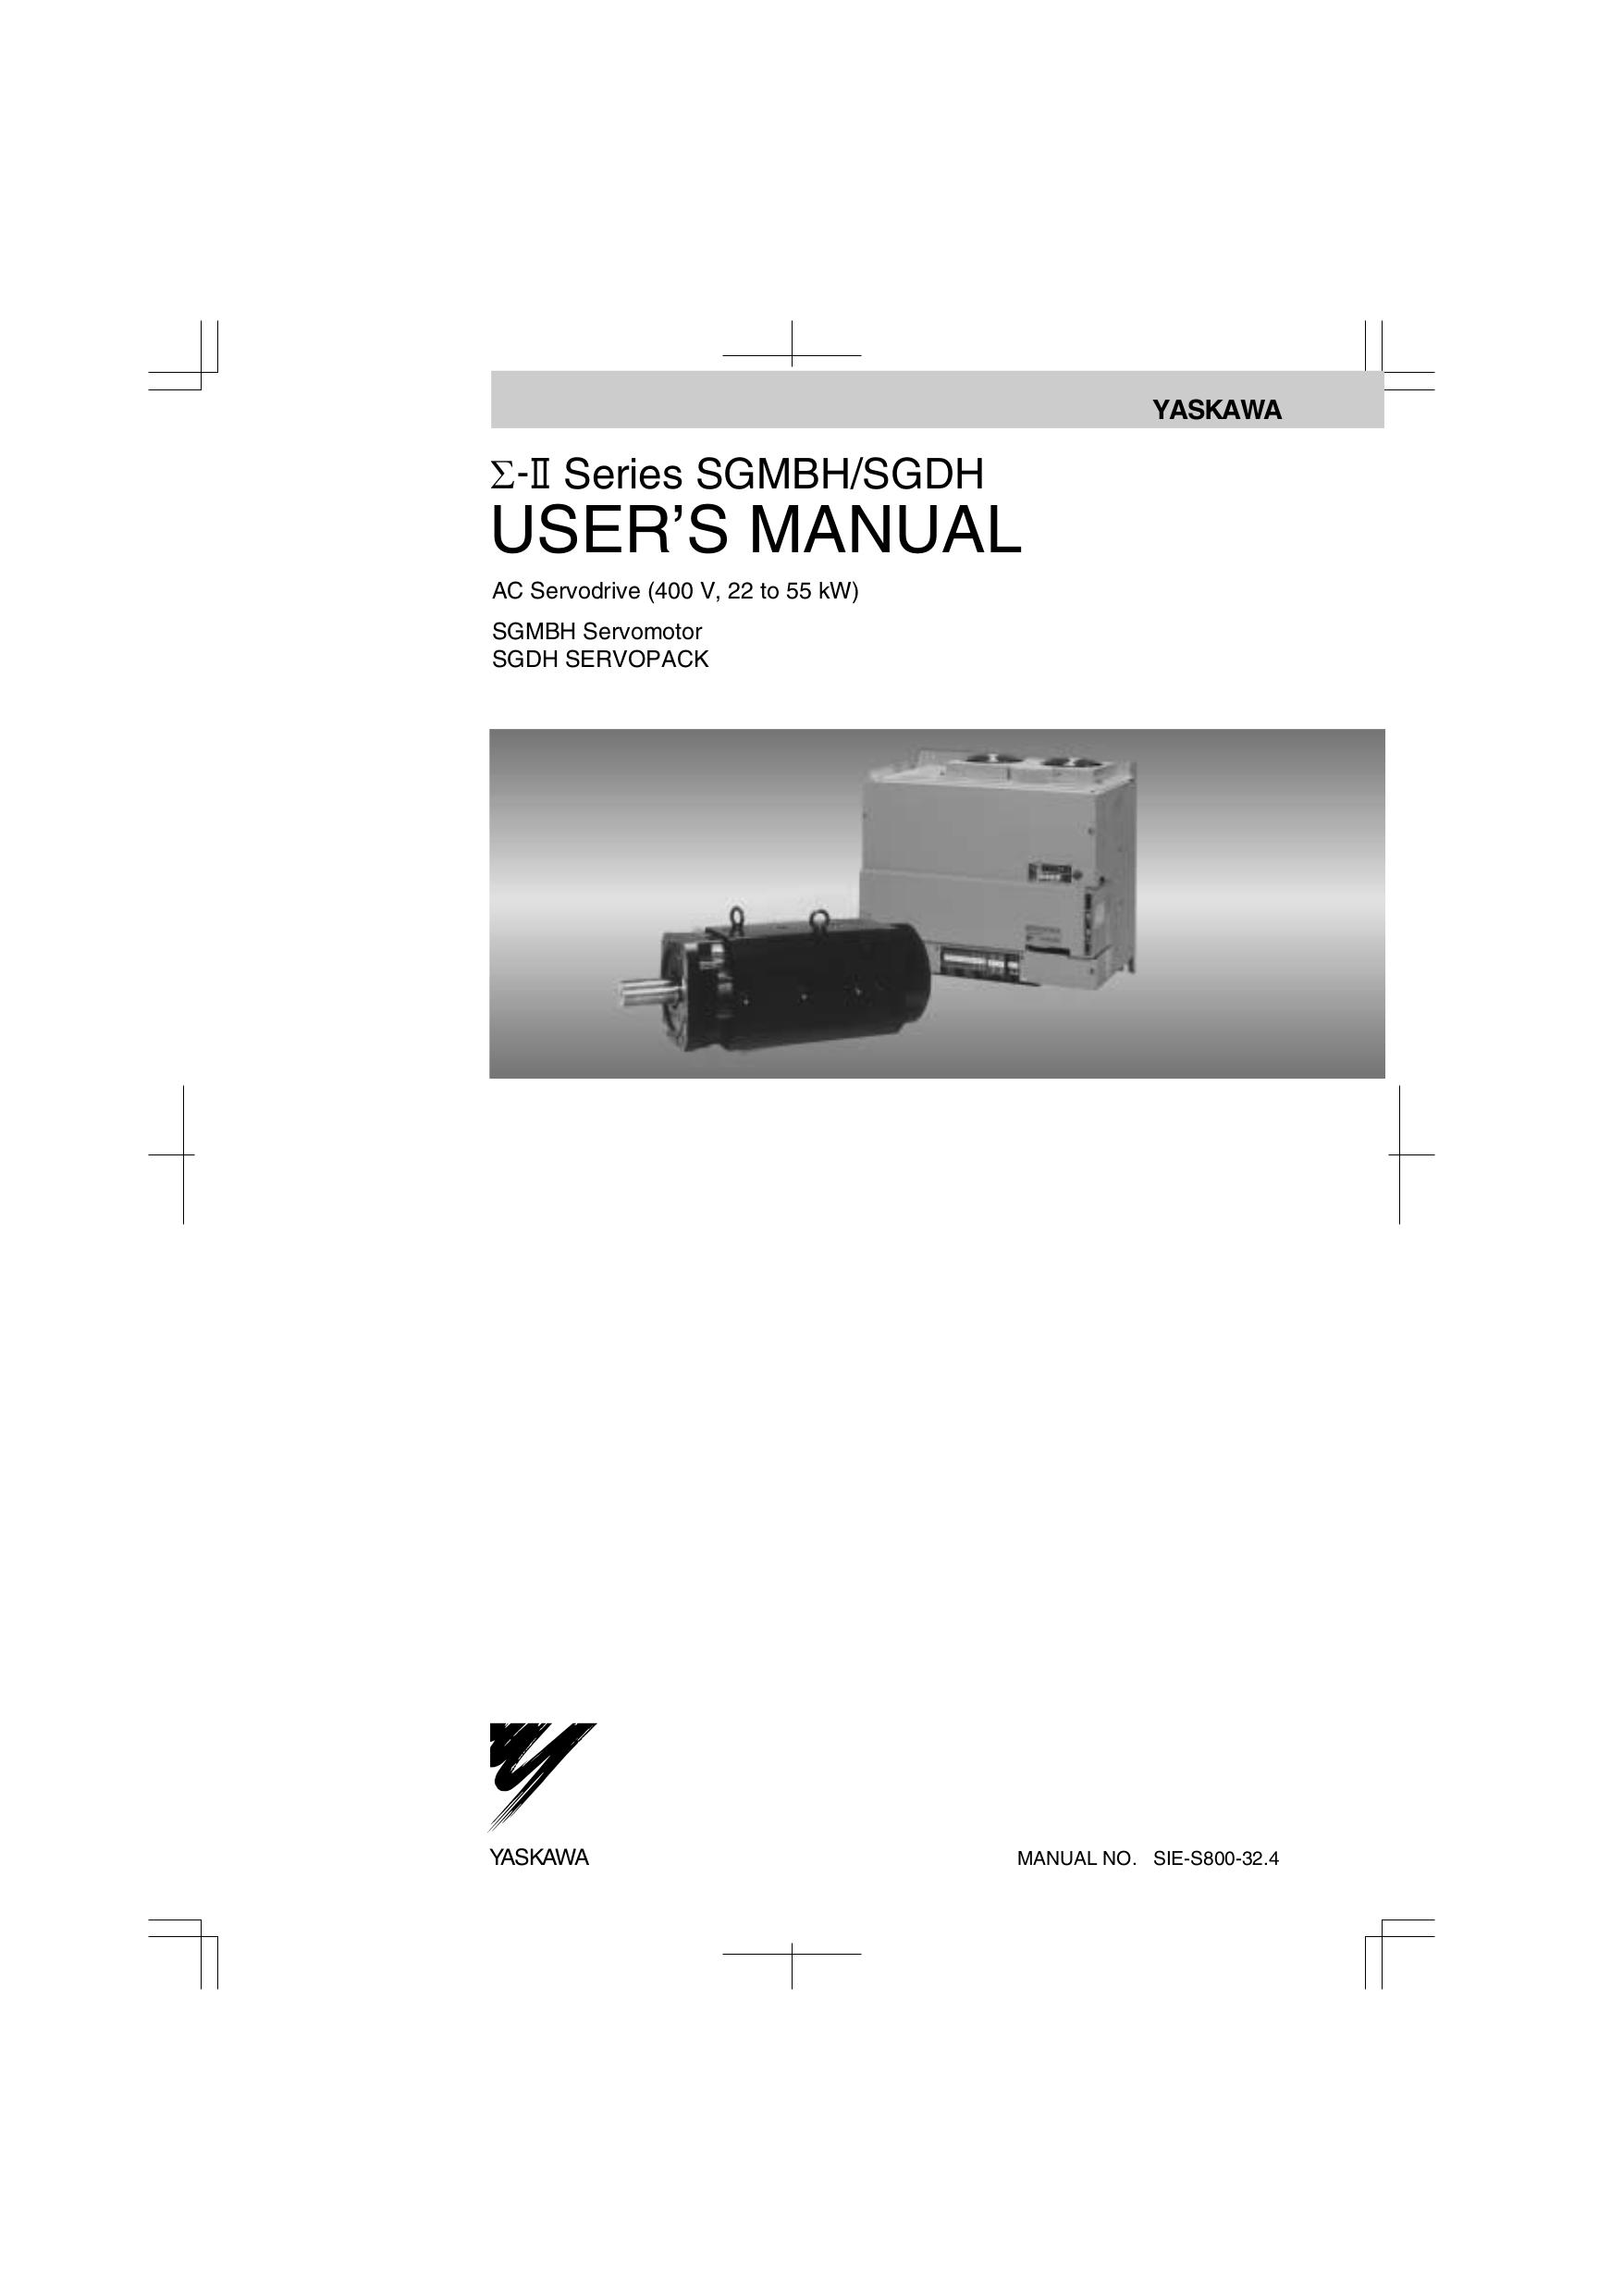 download free pdf for sima dv 6400 digital camera manual rh umlib com Canon Digital Camera Manual Camera Instruction Manuals